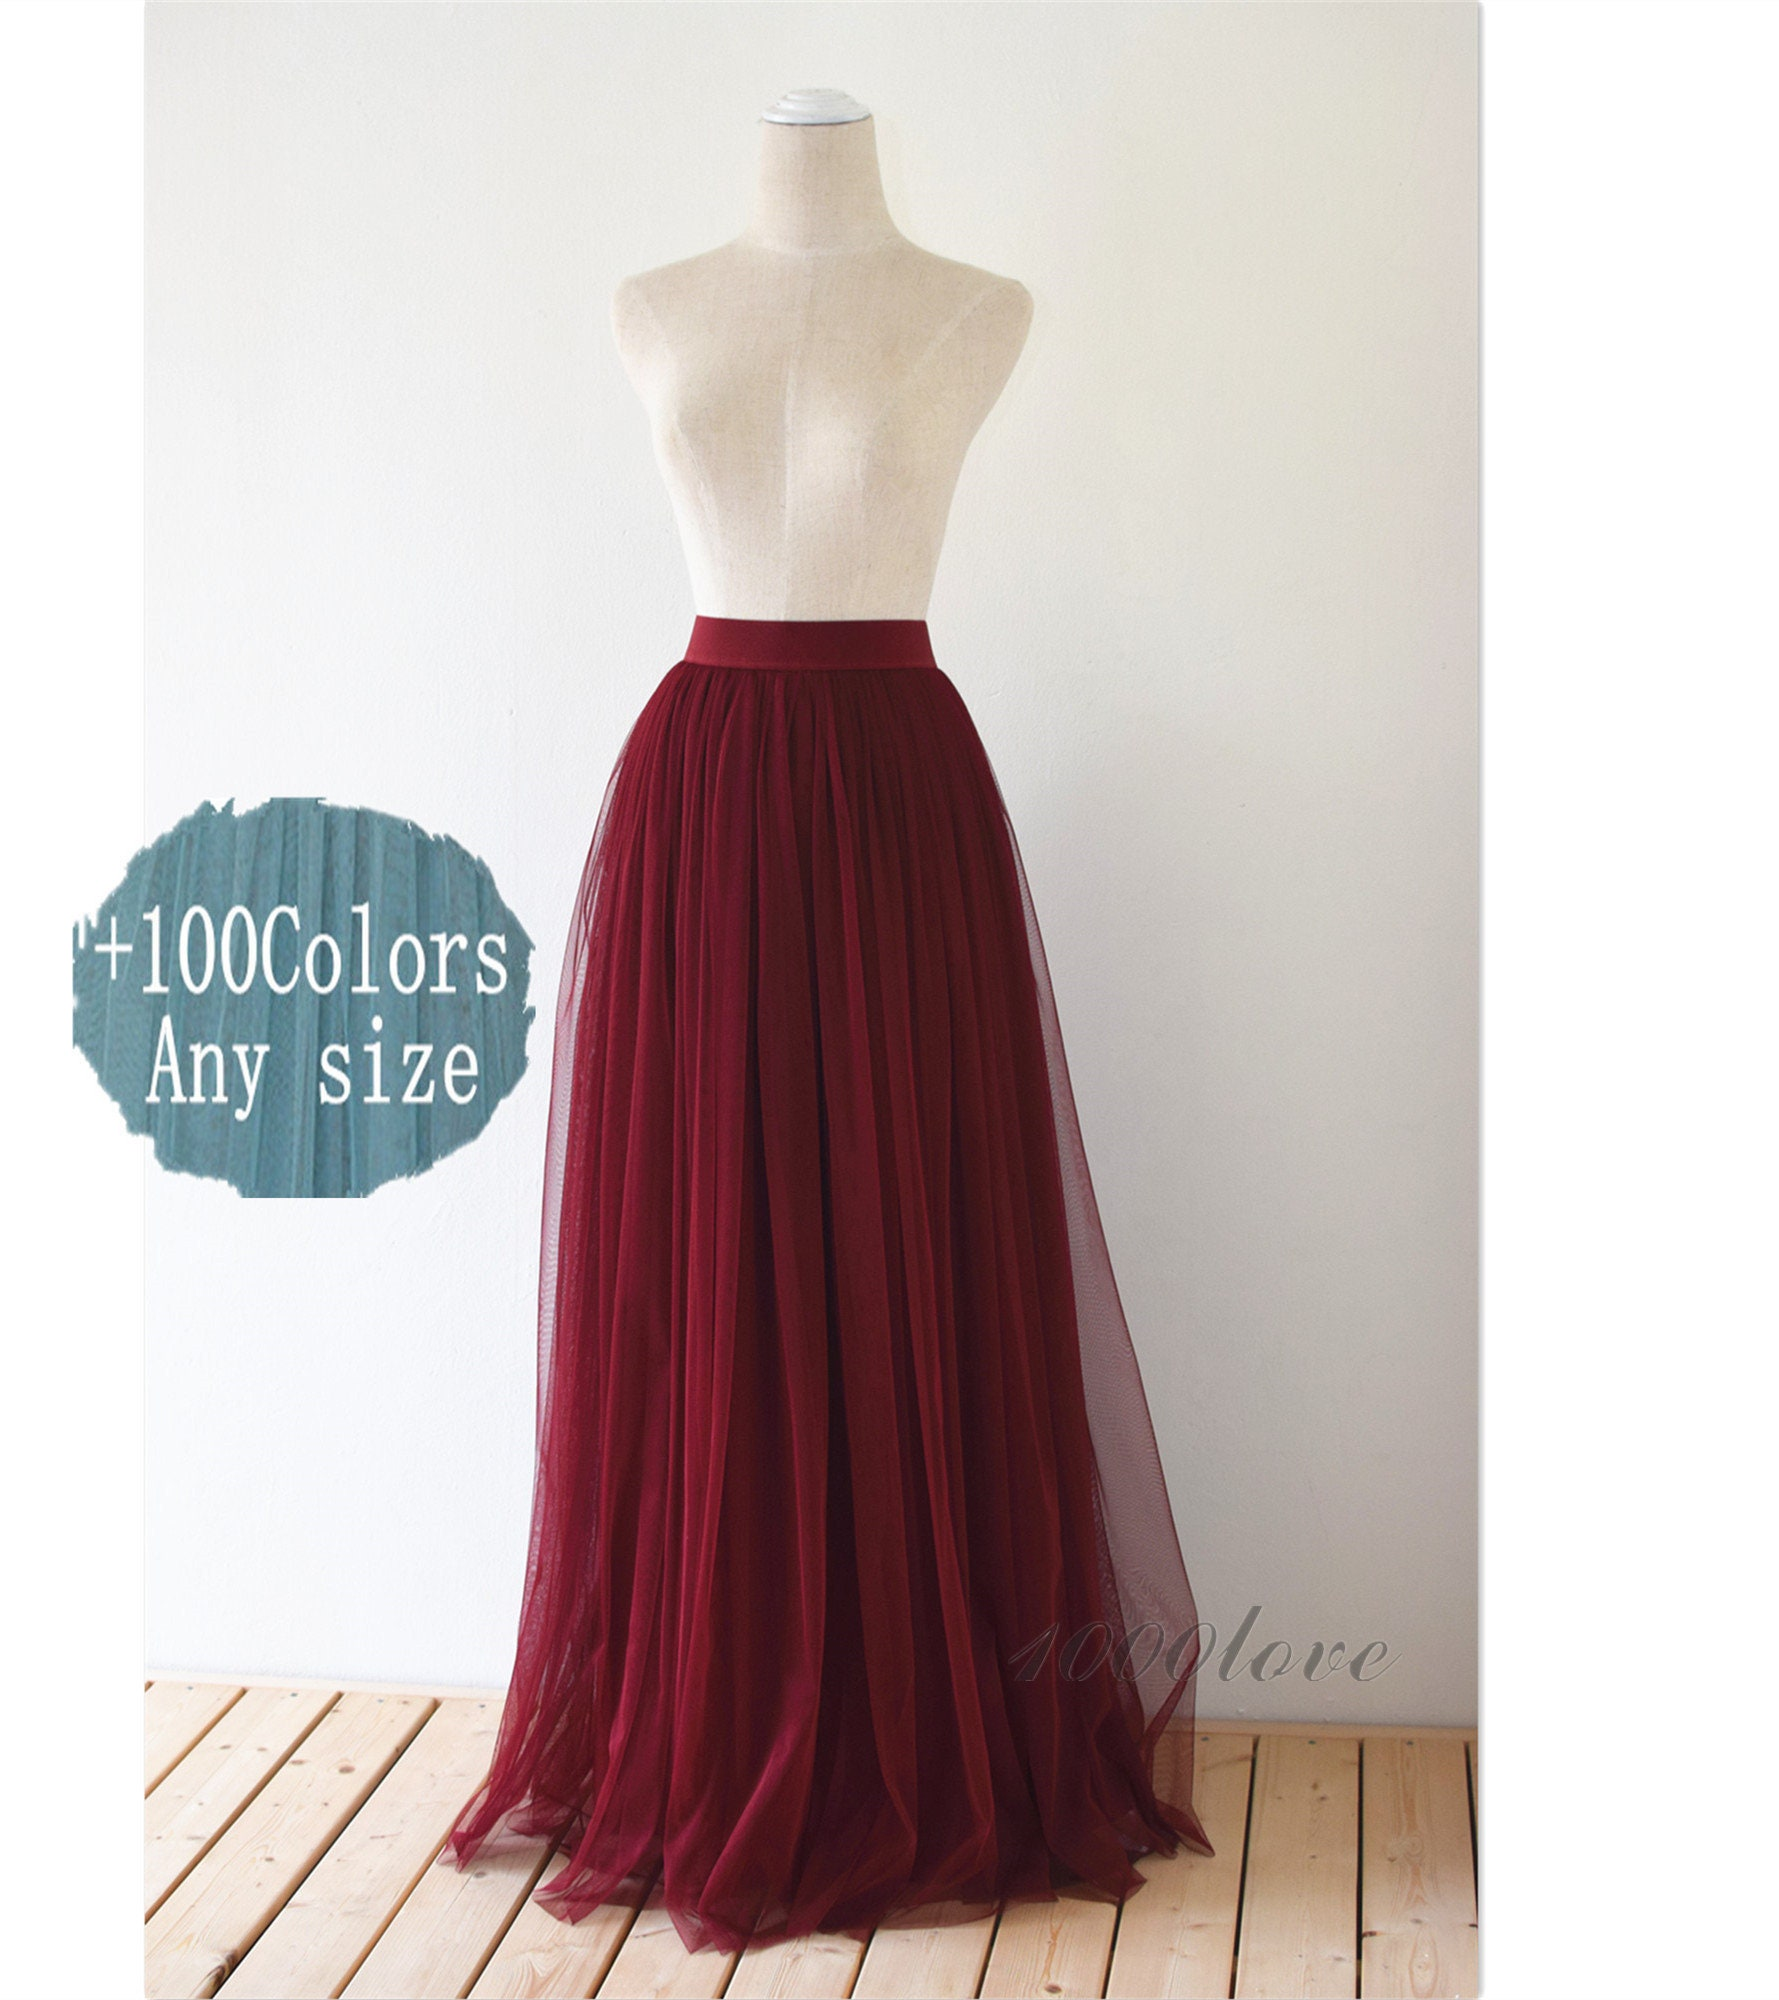 d409d0017b36 Deep Red Wine Bridesmaid Dresses